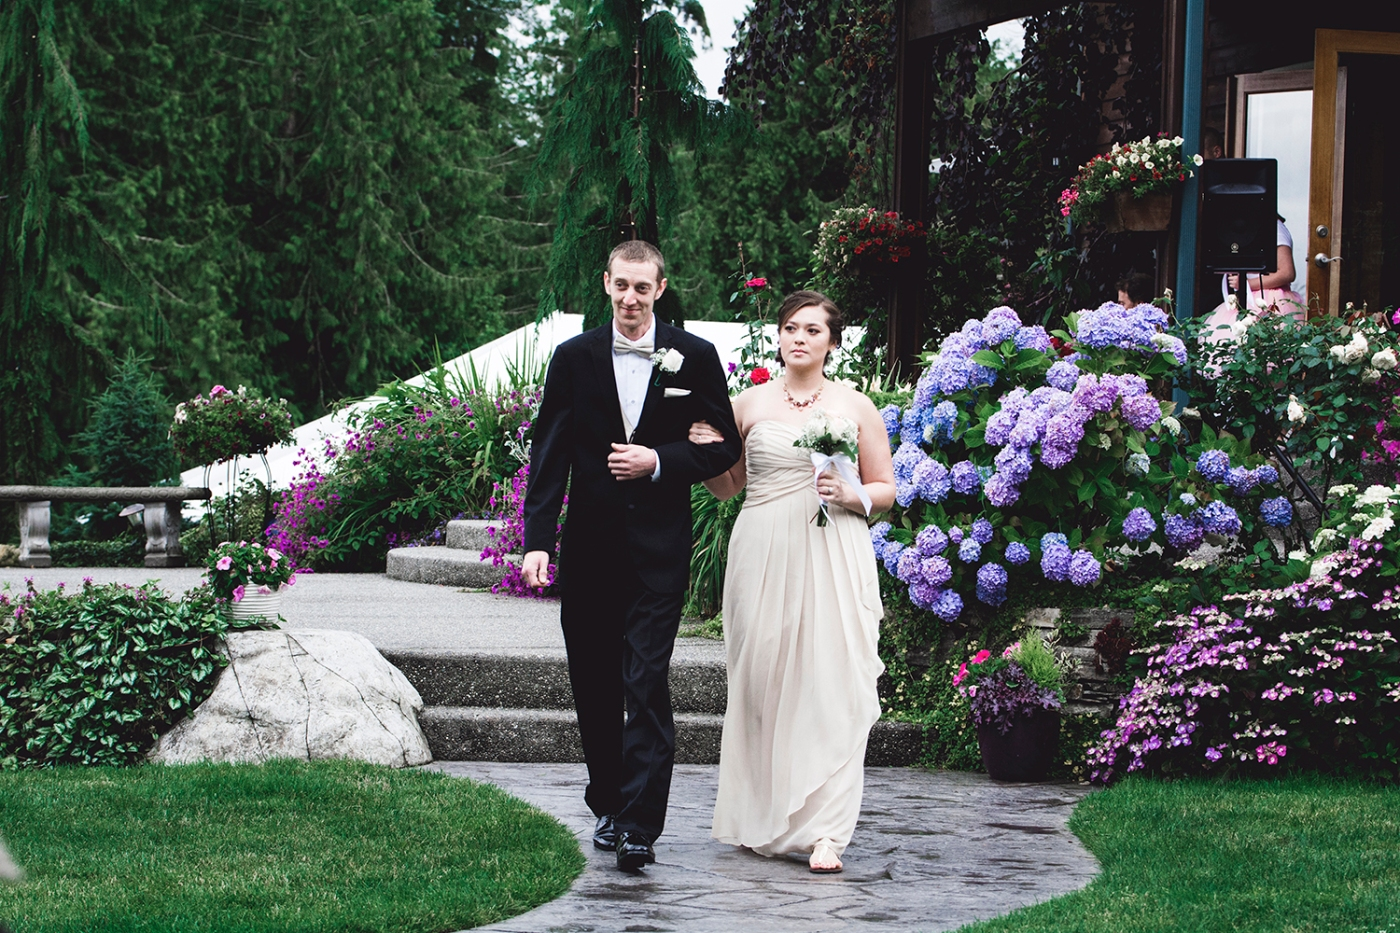 Jane_Speleers_2016_Details_Wedding_Wild_Rose_Estates_Venue_JS7_7730